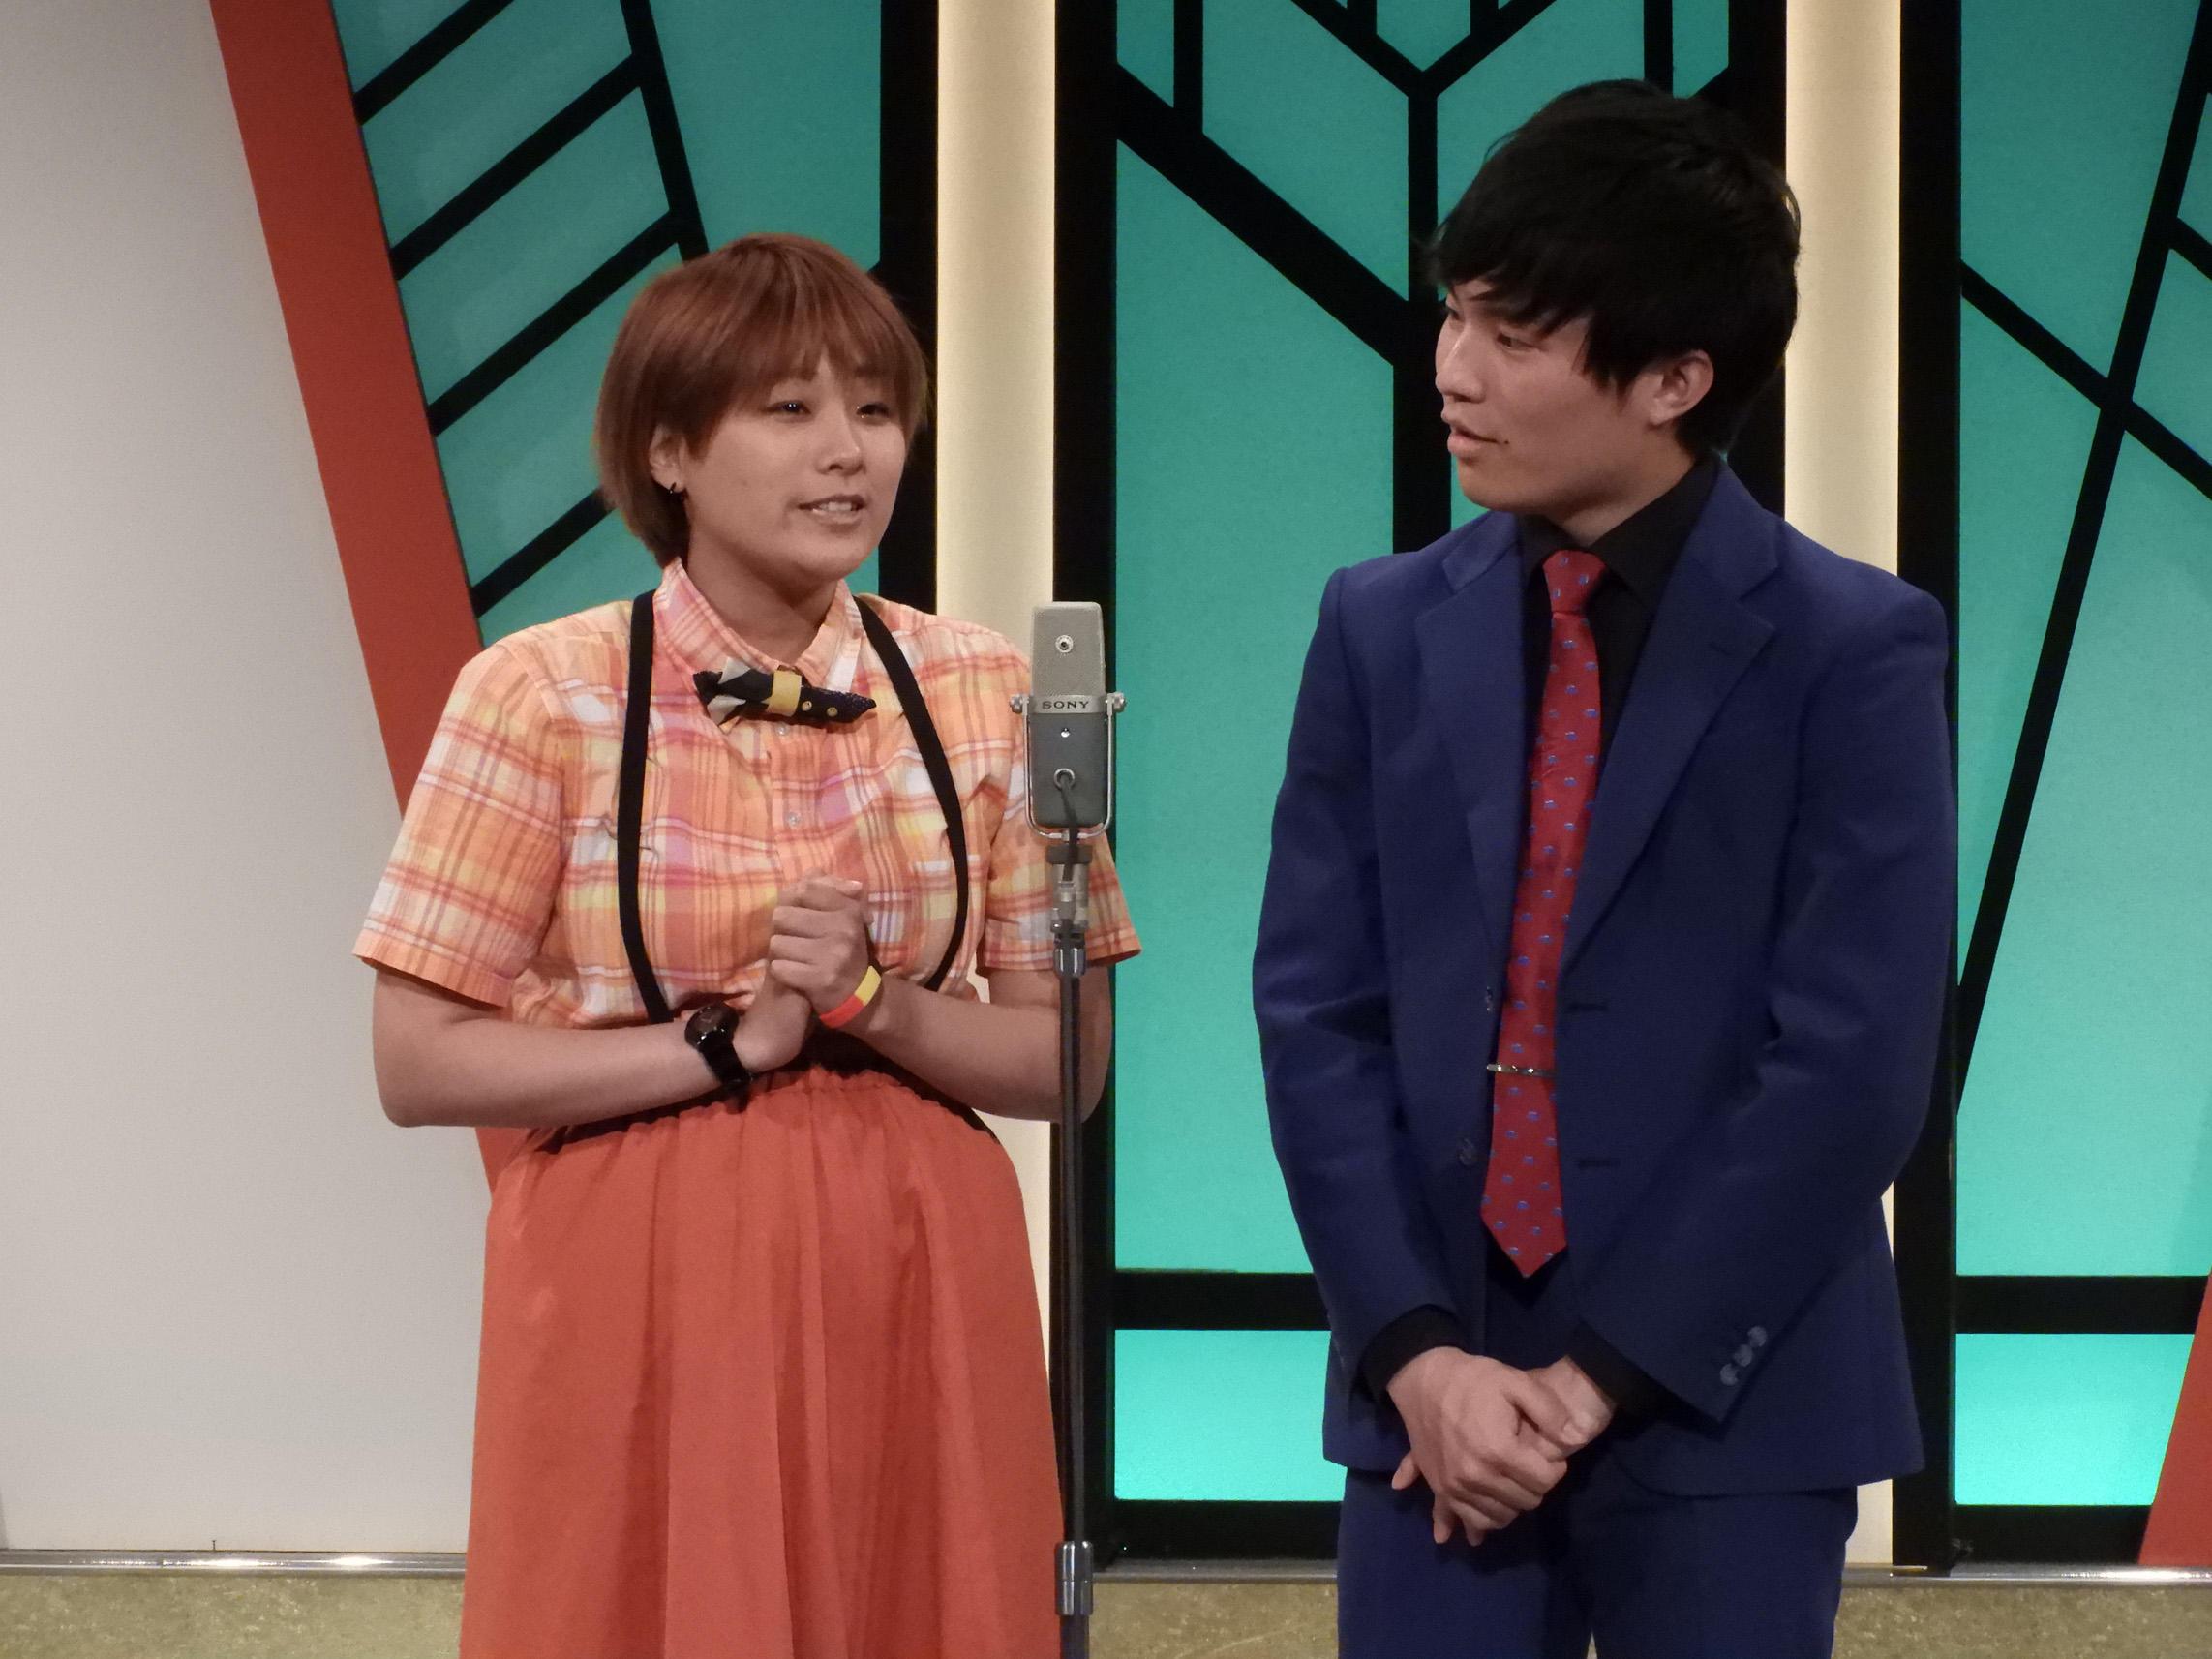 http://news.yoshimoto.co.jp/20180511110449-2c421abbc6fcef01173f6b3bccf103369bc8553e.jpg